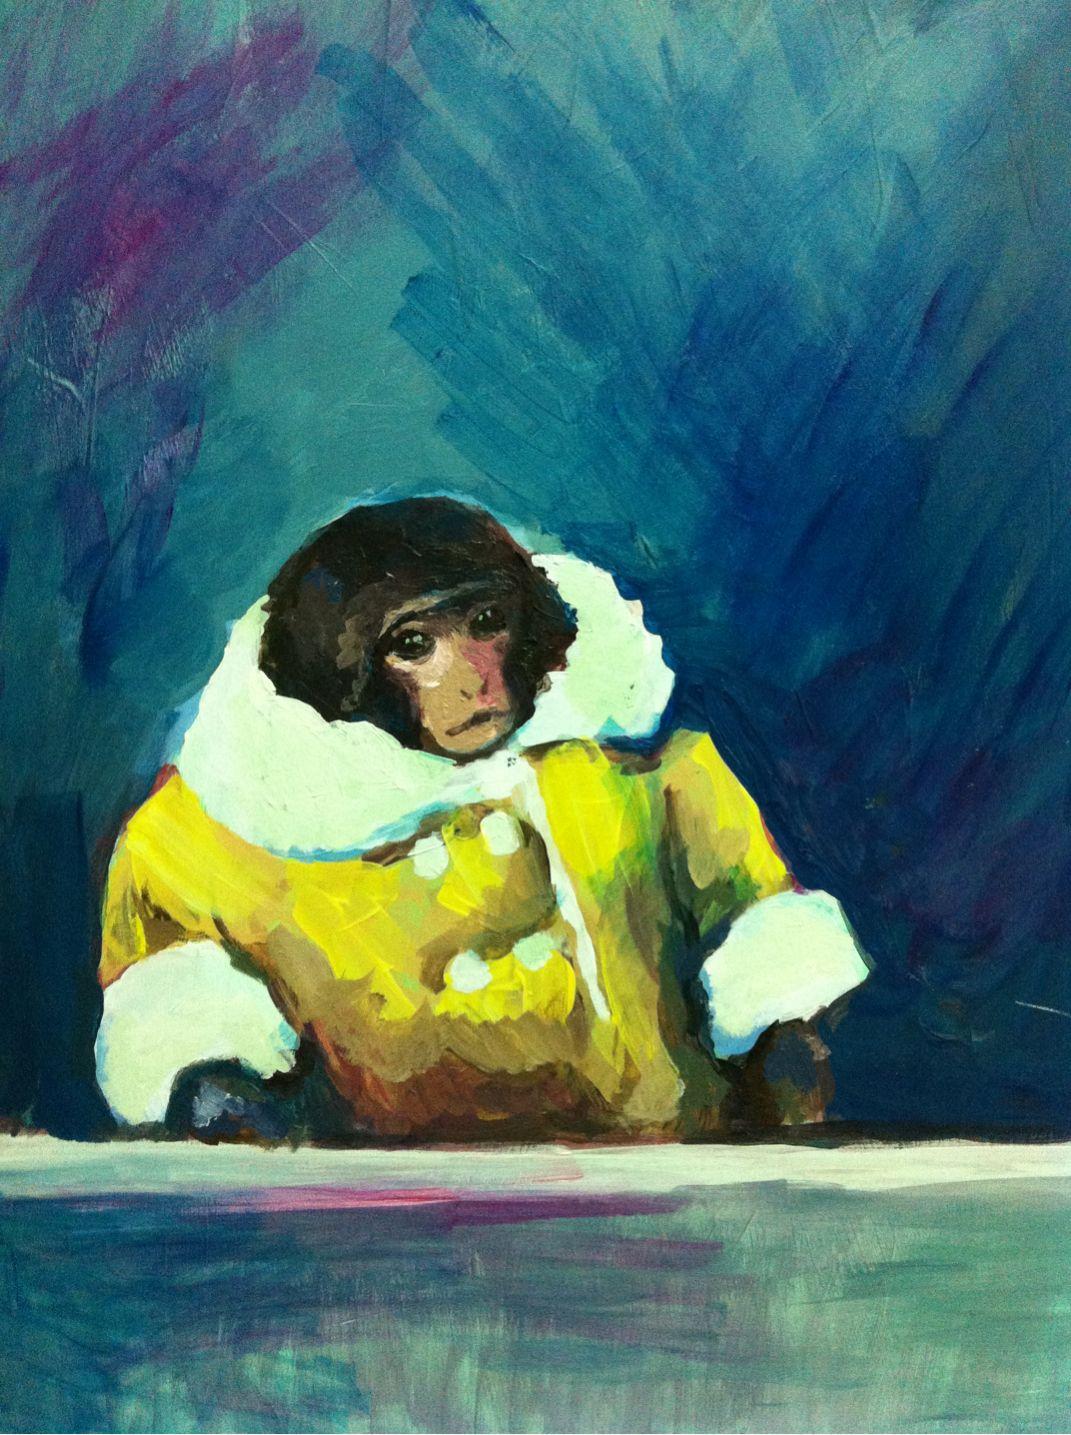 HAHAHAHAH its a painting of Darwin the IKEA monkey, how beautiful ...